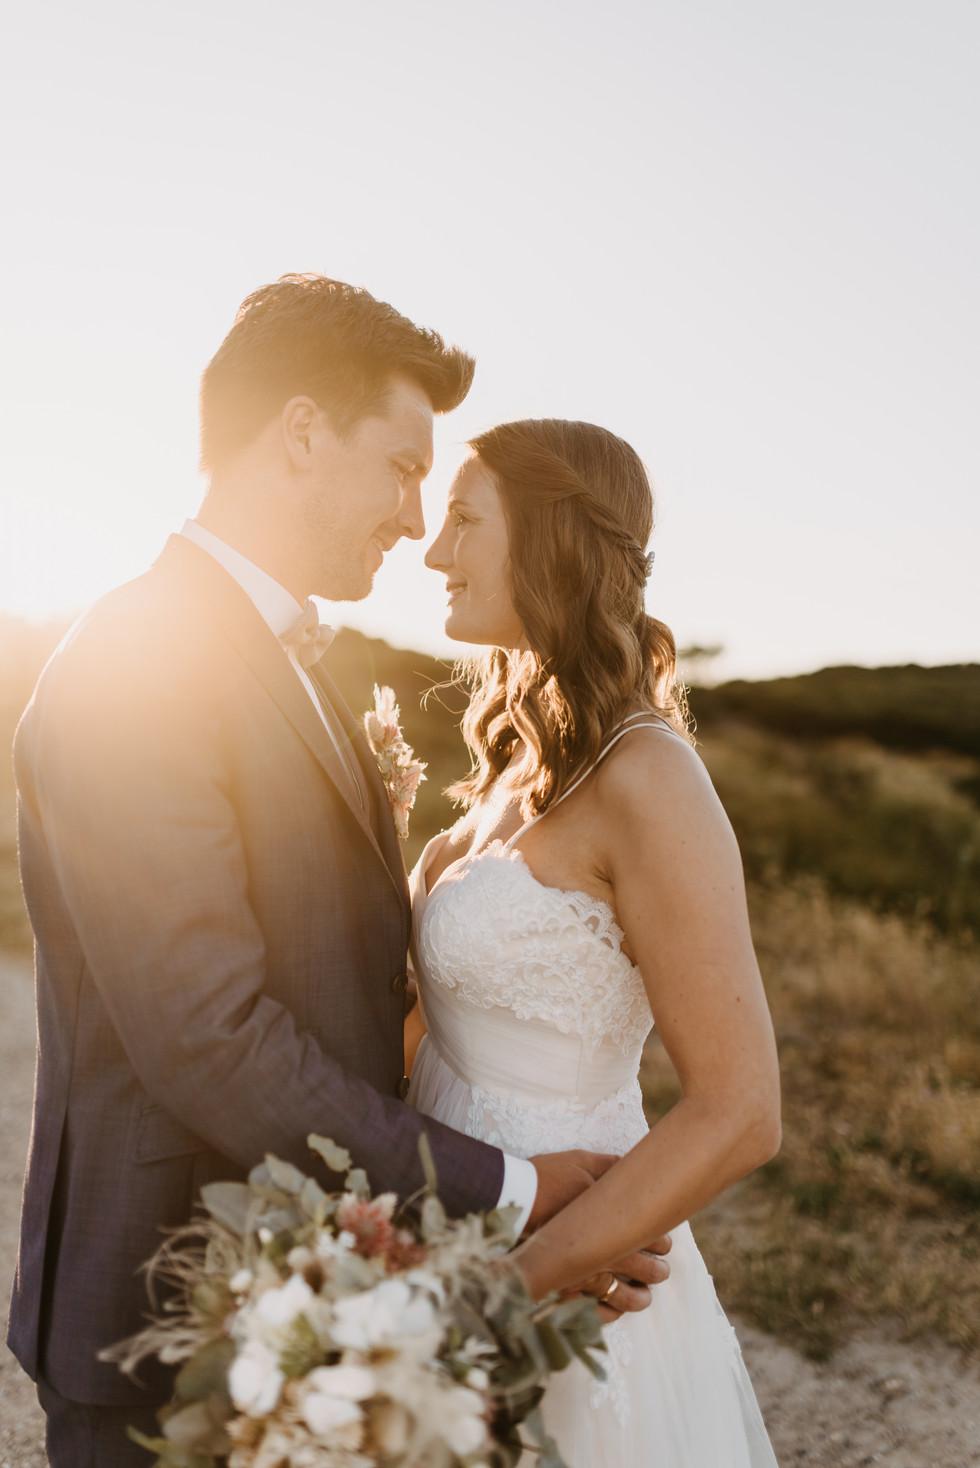 Hochzeit Sylt, Sylthochzeit, Hochzeit auf Sylt, Hochzeitsfotograf Sylt, Hochzeitsfotografie Sylt, Hochzeiten Sylt, Boho Hochzeit Sylt, Sylt fine art wedding, Fine art Sylt, Sylt Fotoshooting, Sylt After Wedding Shooting, Sylt fotograf, Fotografin Sylt